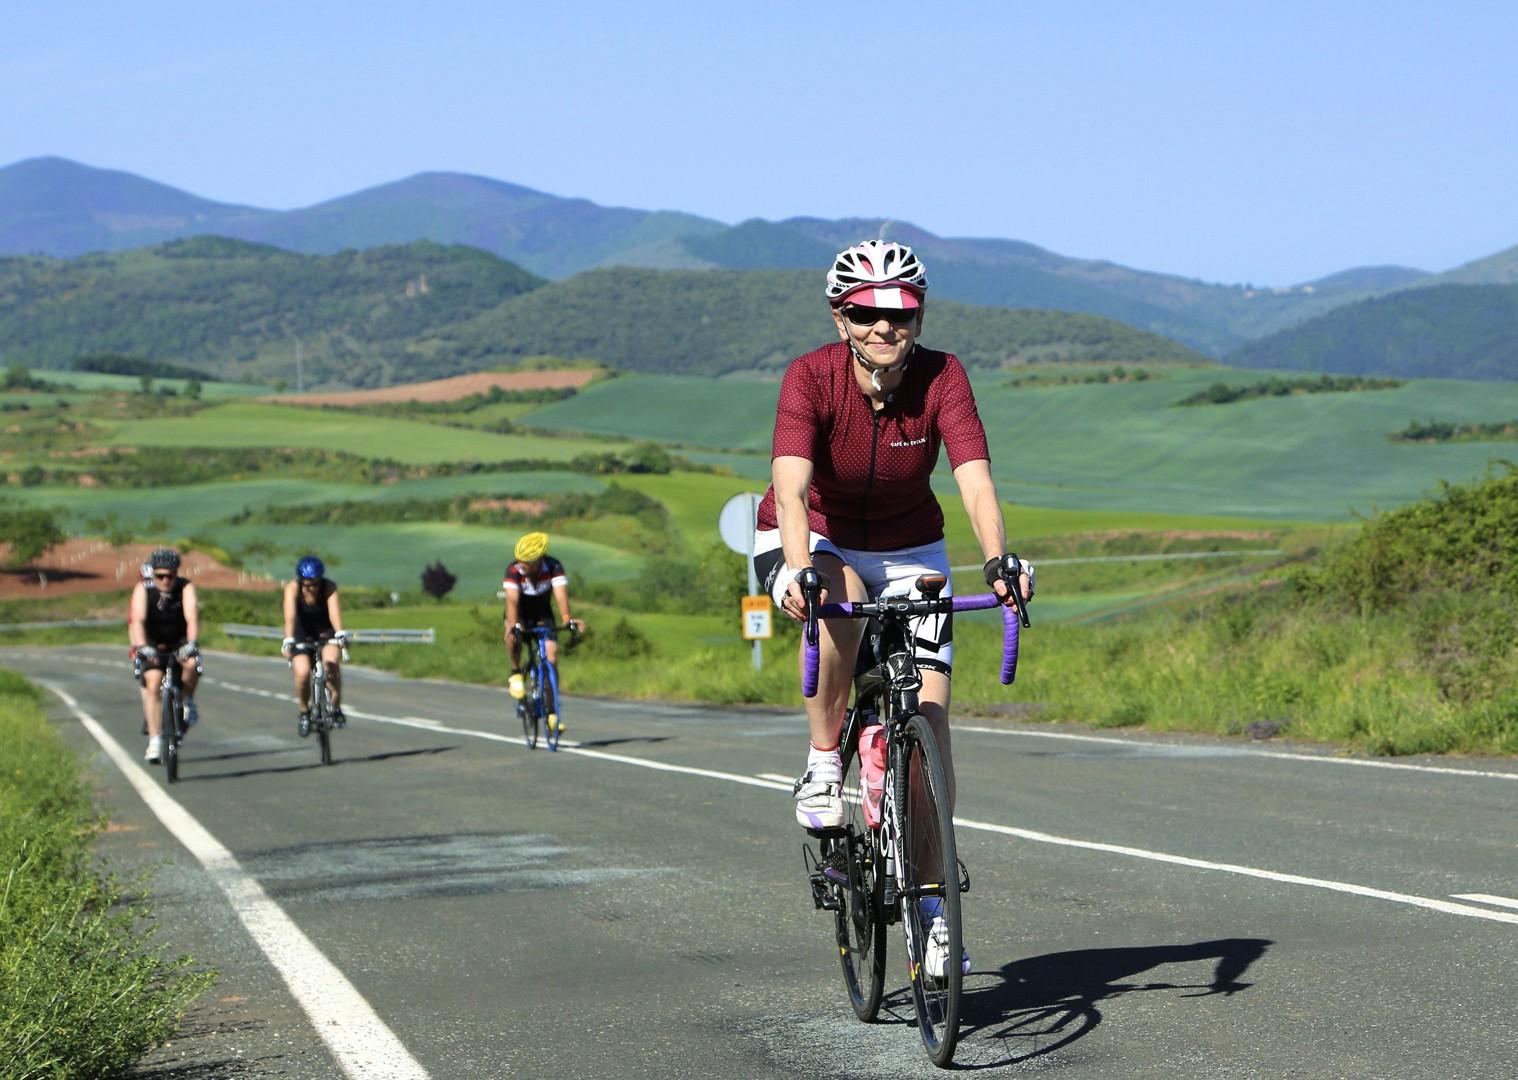 delnortealsur10.jpg - Northern Spain - Rioja - Ruta del Vino - Guided Road Cycling Holiday - Road Cycling